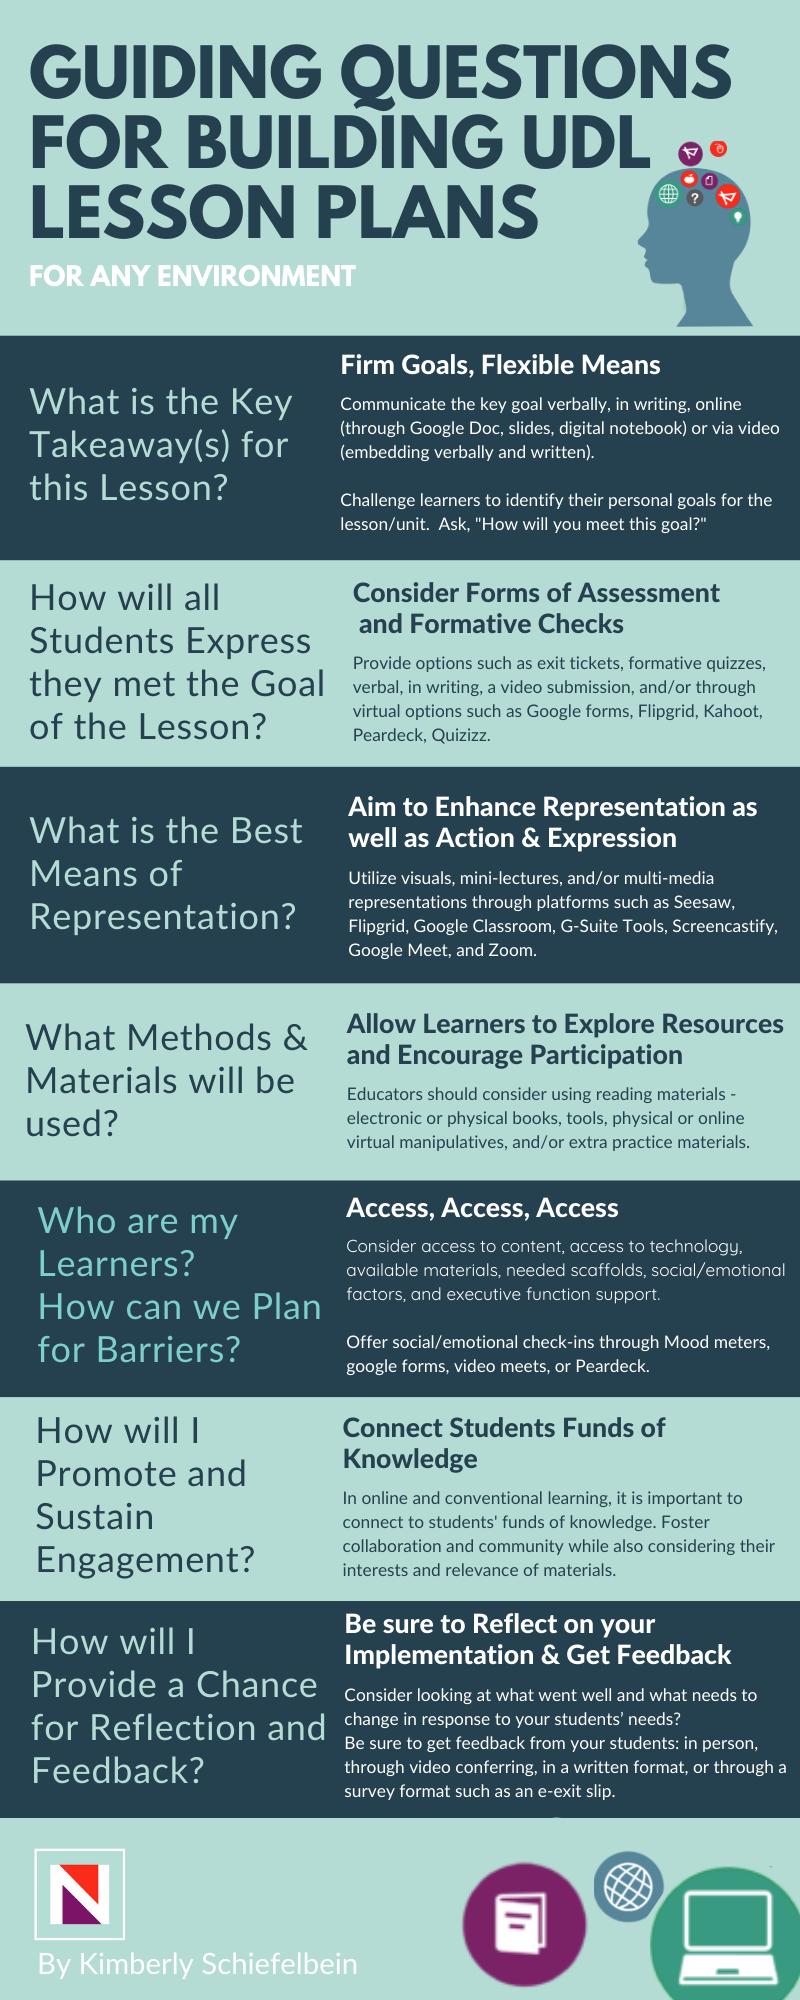 Guiding Questions for Building UDL Lesson Plans